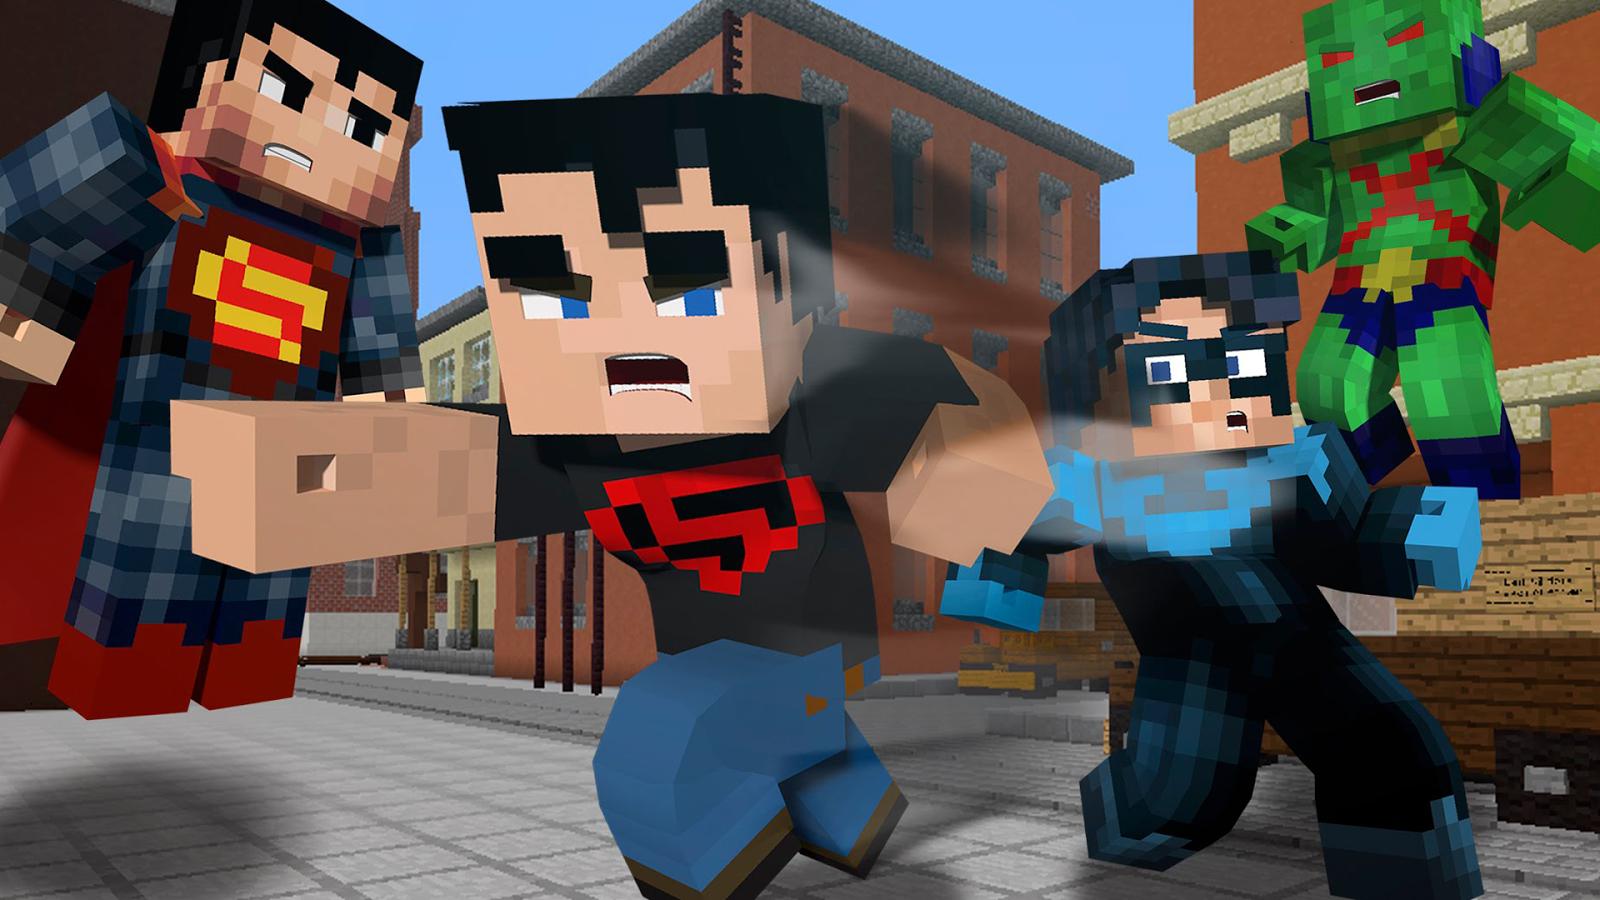 Superhero Minecraft Skins V APK Download Android Books - Minecraft skins fur android